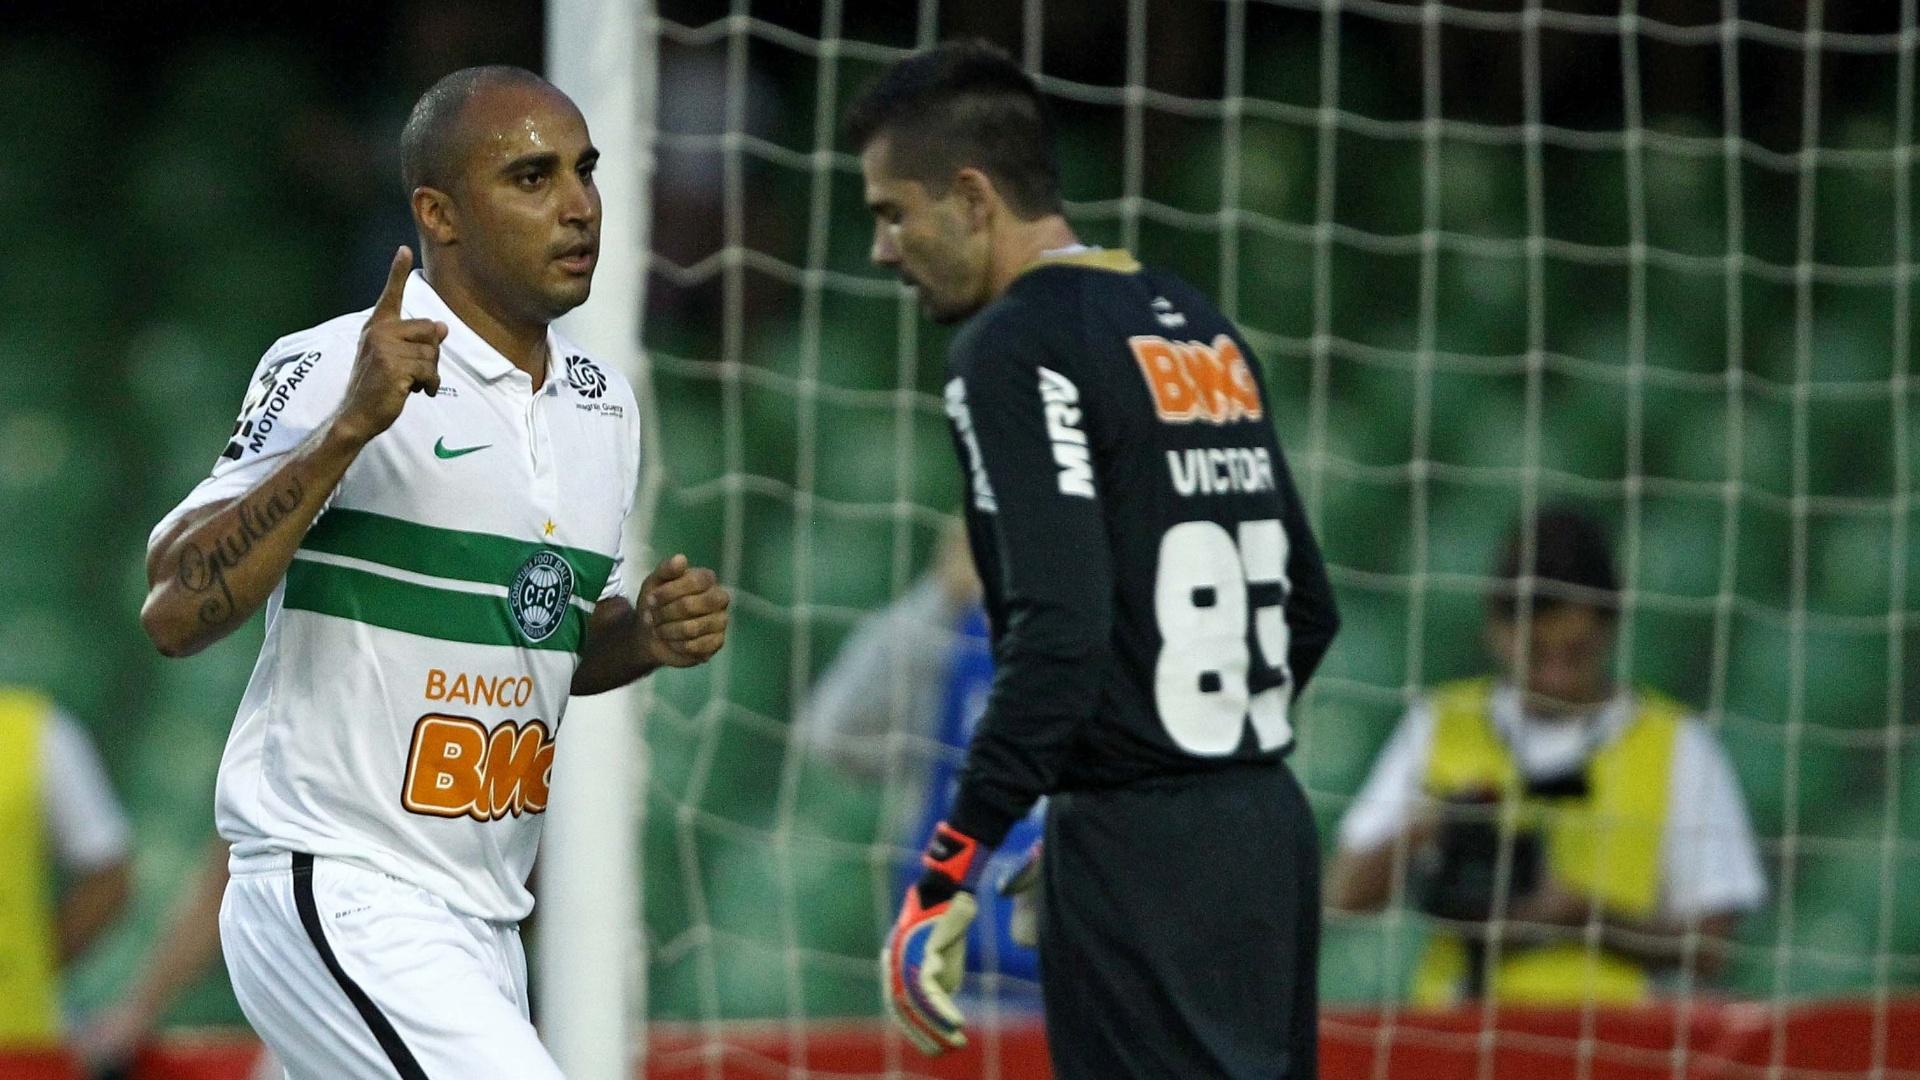 Deivid comemora gol marcado na partida contra o Atlético-MG no Couto Pereira